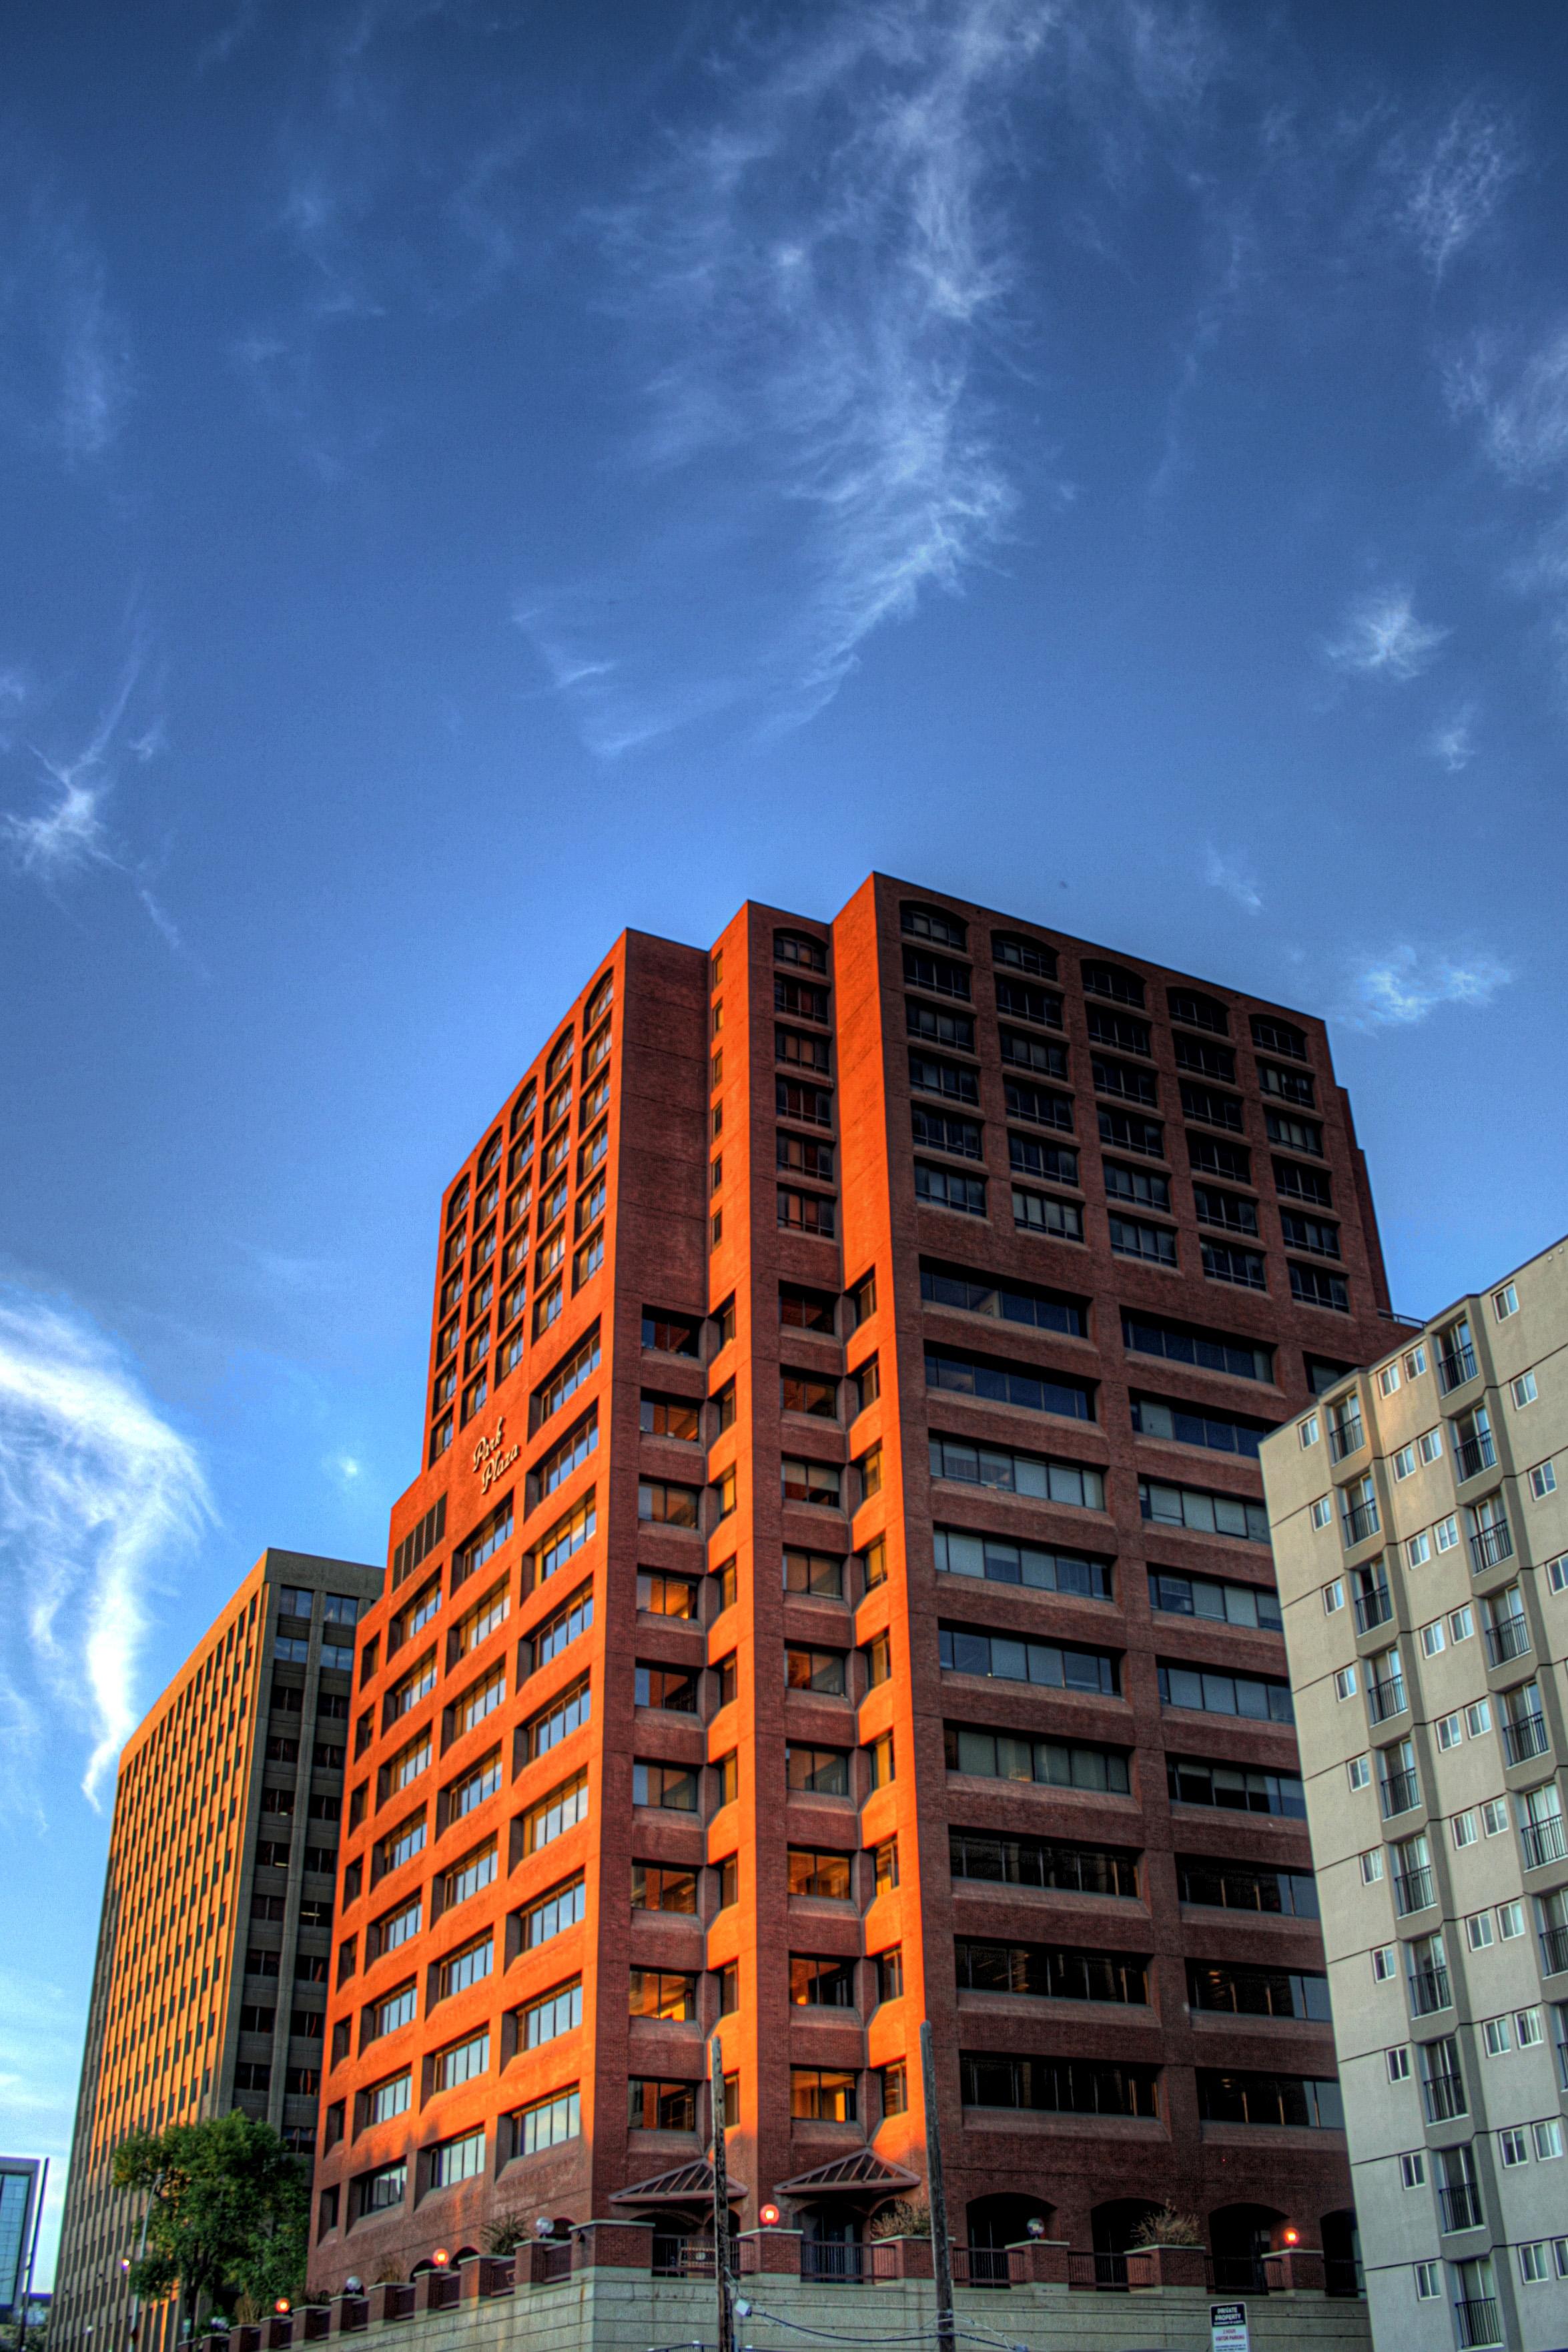 park-plaza-building-edmonton-alberta.jpg